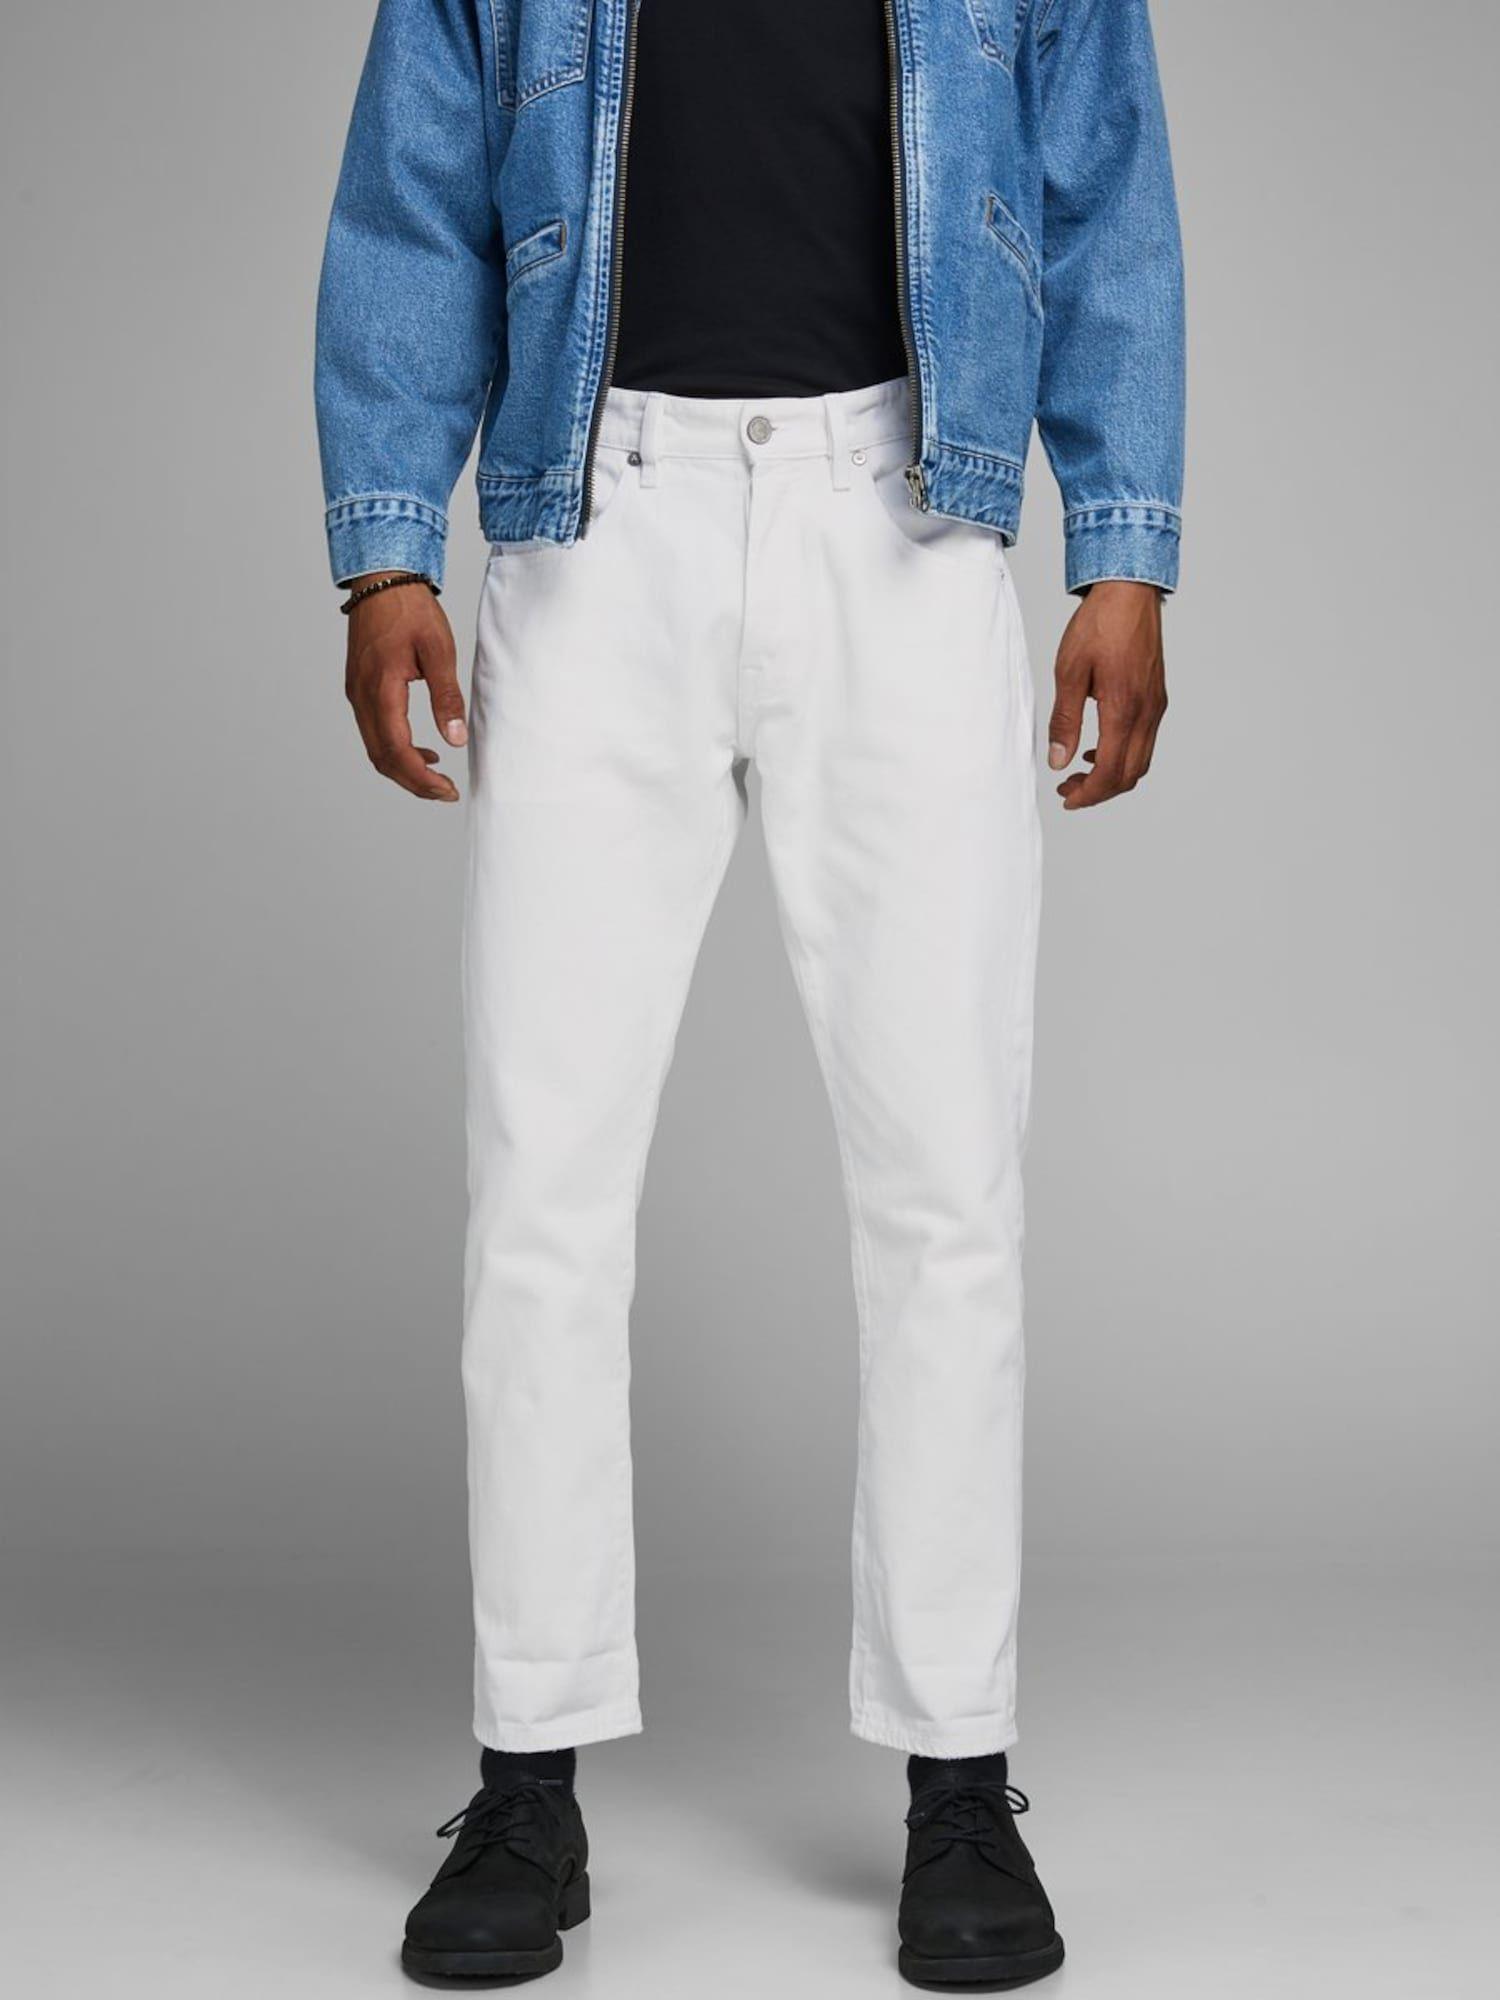 JACK & JONES Jeans 'Frank Leen CJ 454' Herren, Weiß, Größe 32 #whitepantsuit